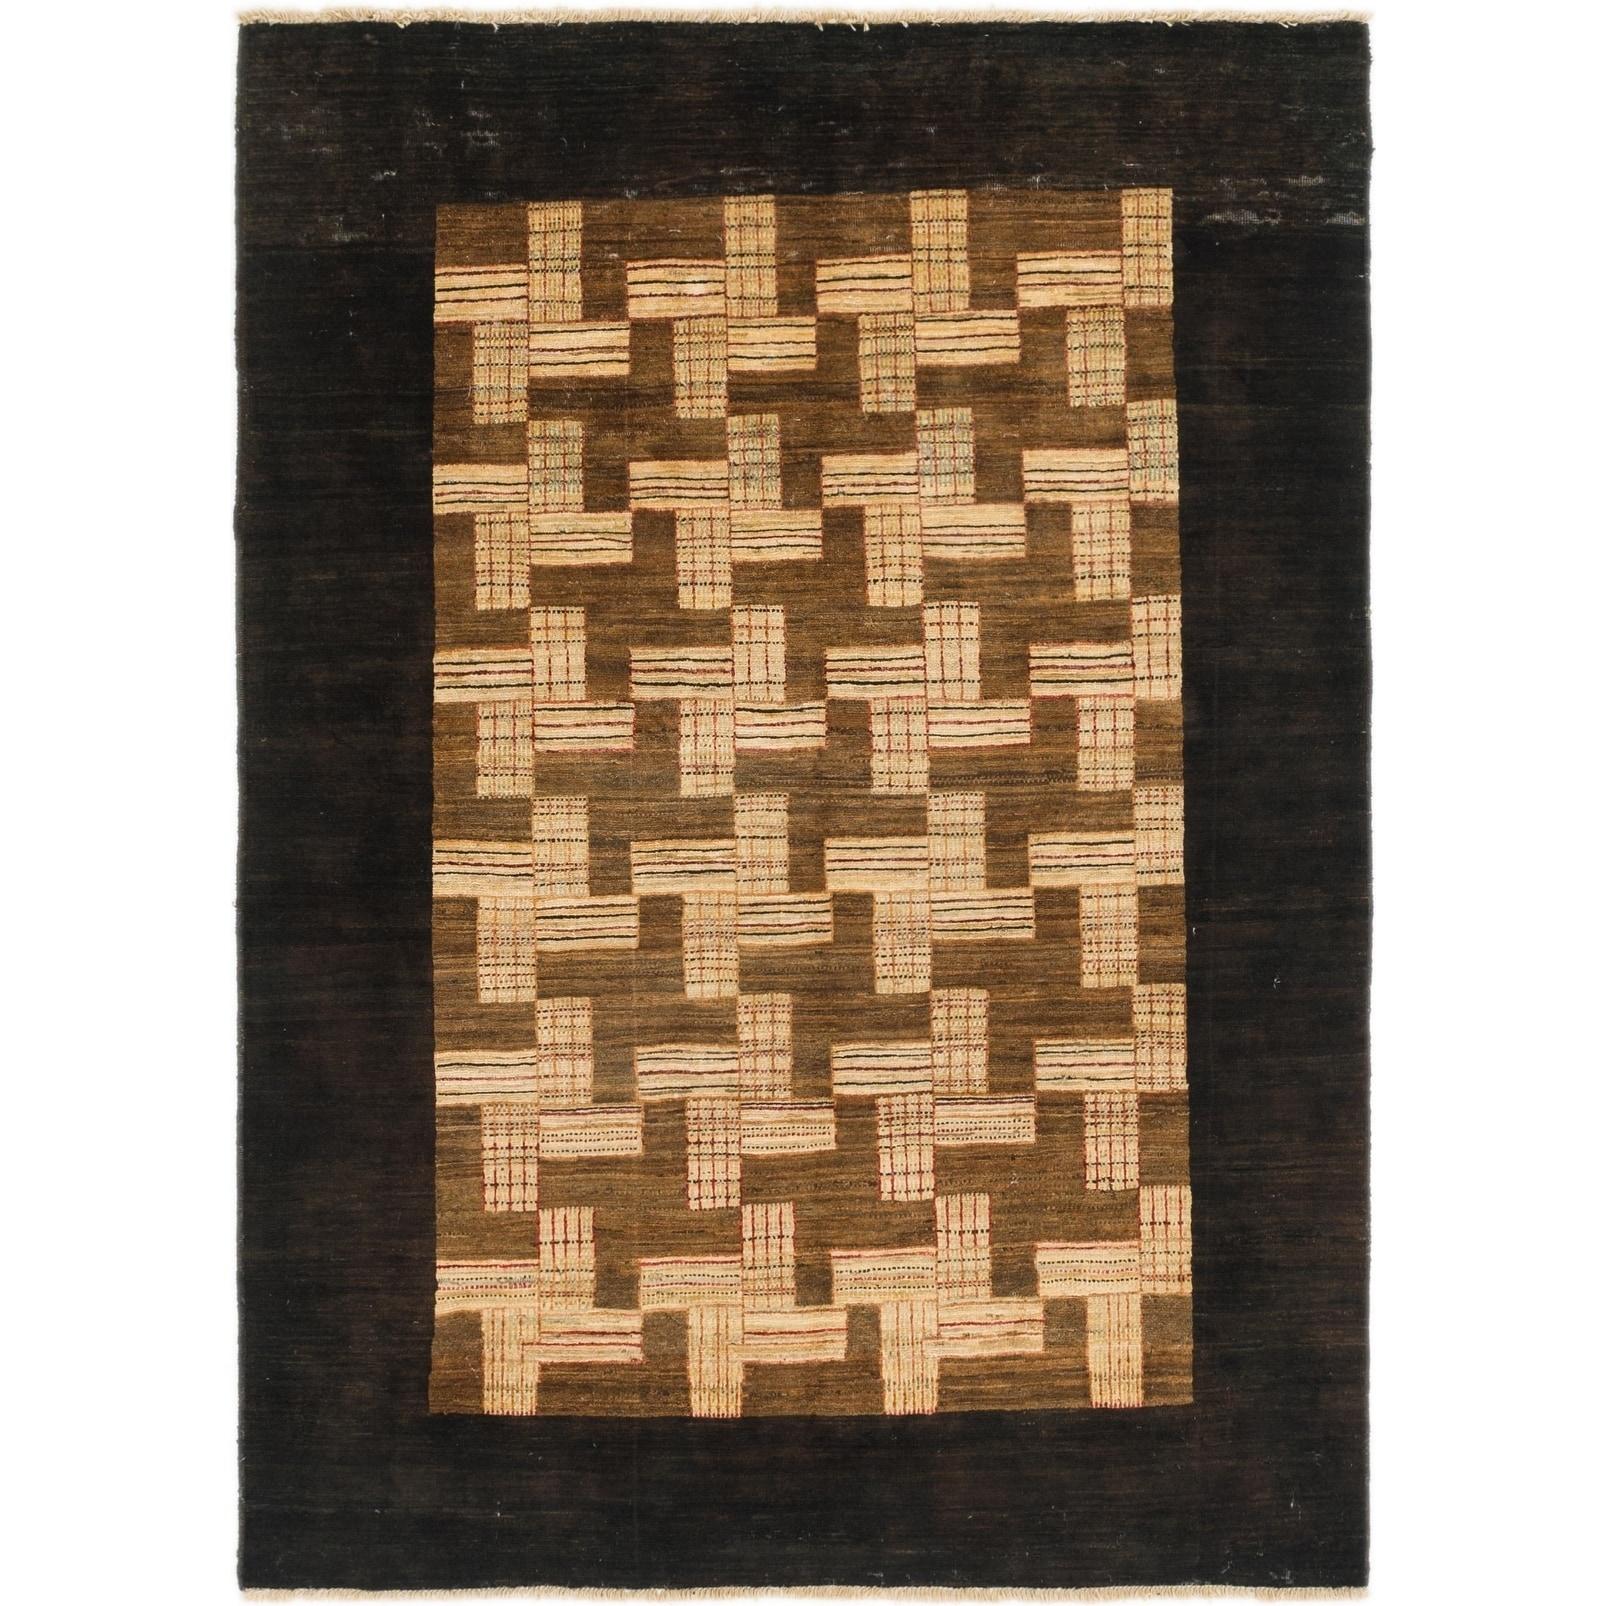 Hand Knotted Kashkuli Gabbeh Wool Area Rug - 4 10 x 6 8 (Black - 4 10 x 6 8)